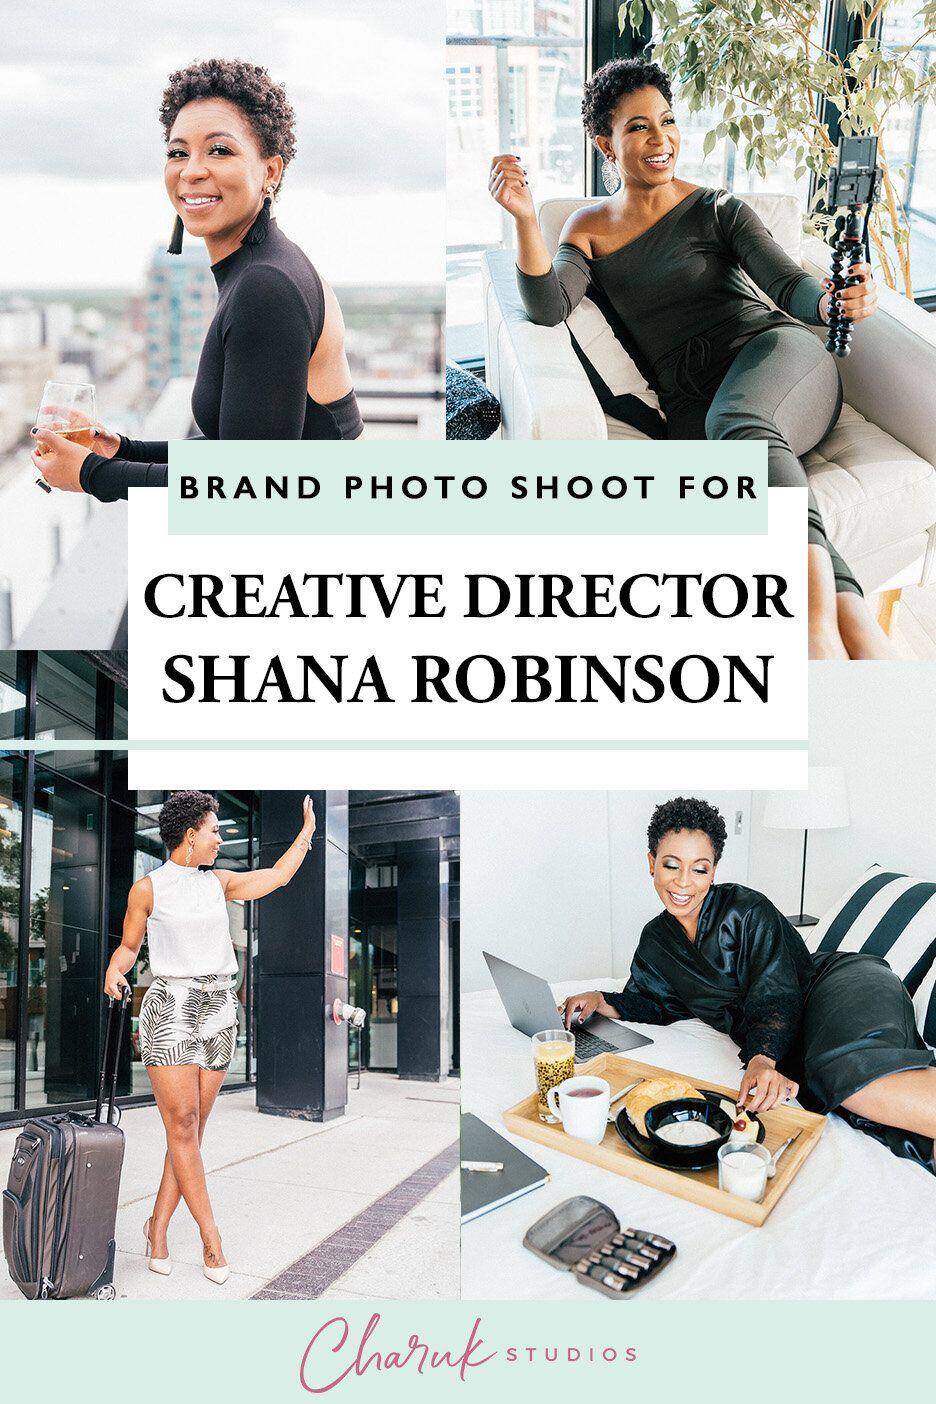 Brand Photo Shoot for Creative Director Shana Robinson by Charuk Studios